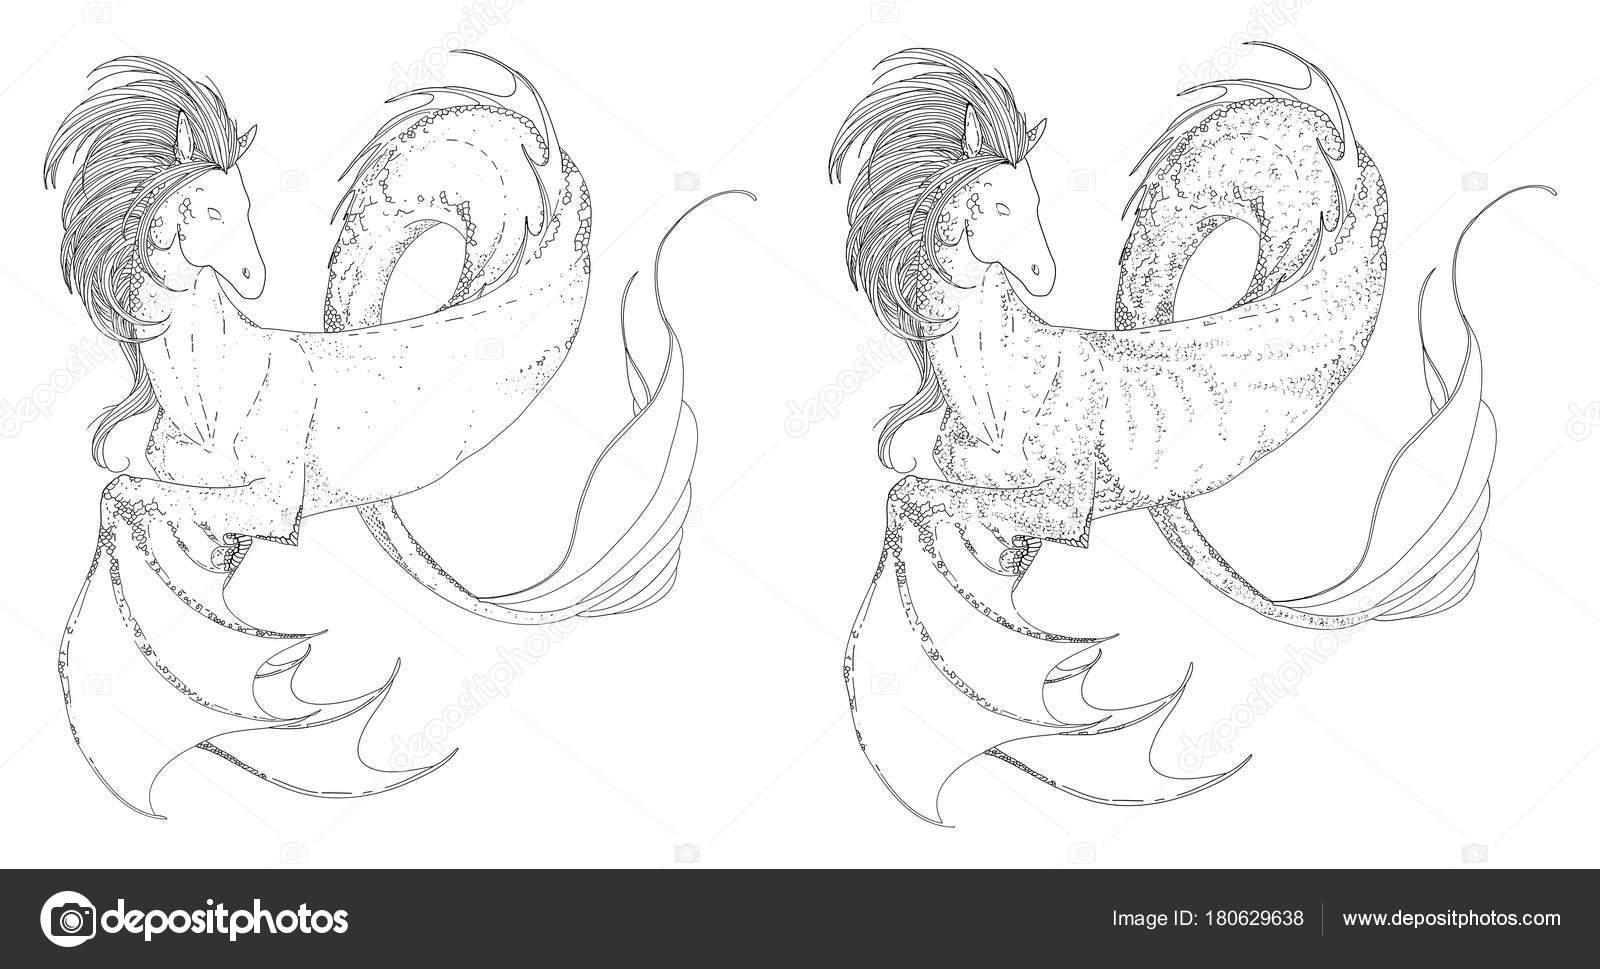 Hand Drawn Vintage Hippocampus Kelpie Magic Sea Water Horse Folklore Stock Vector C Gluiki 180629638